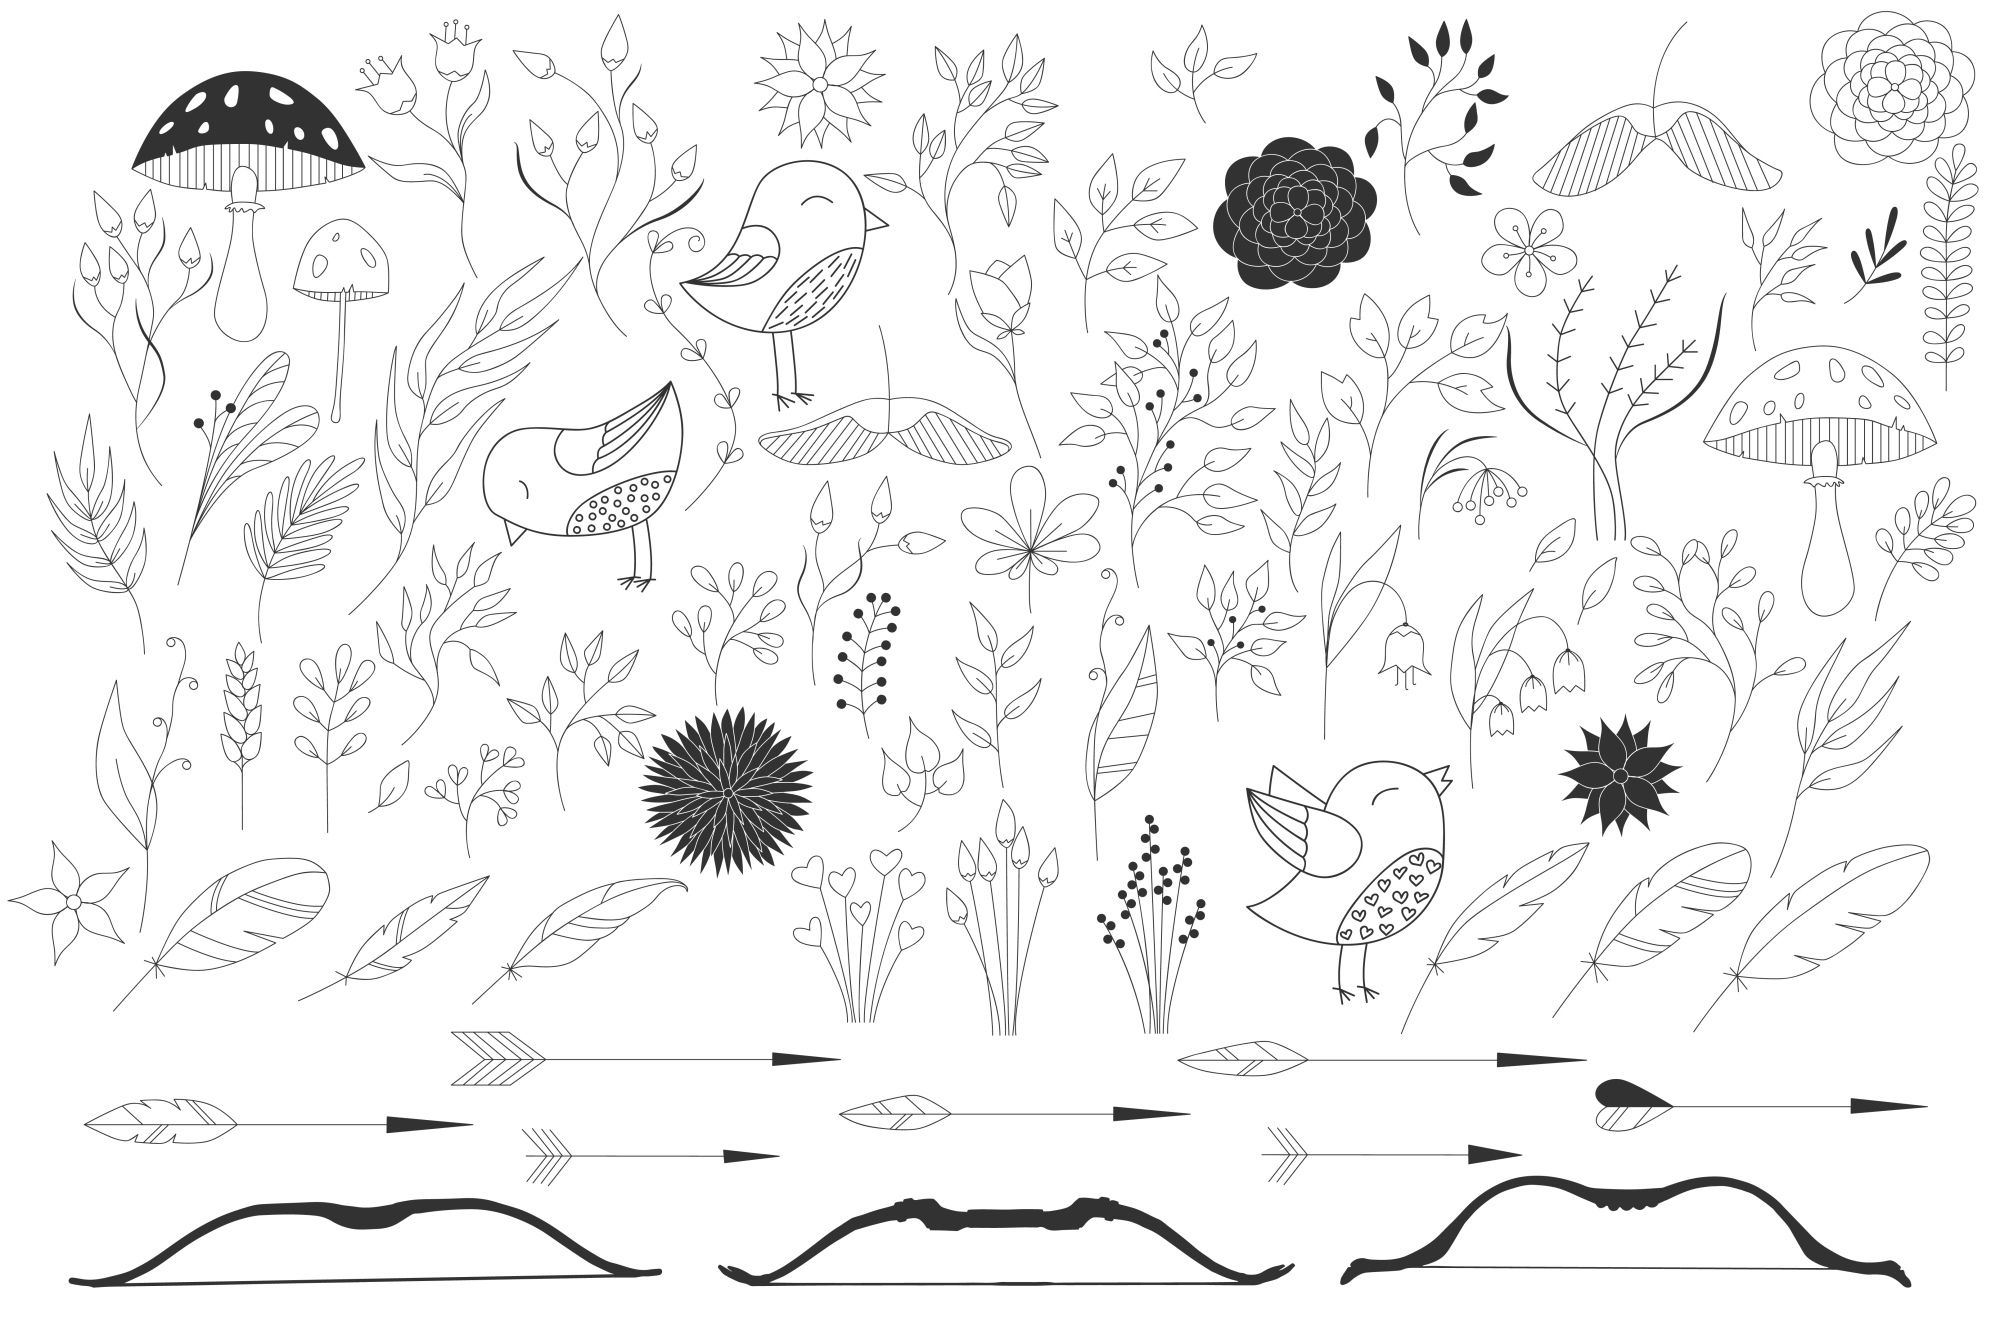 450 handsketched elements. Nature mega pack example image 9